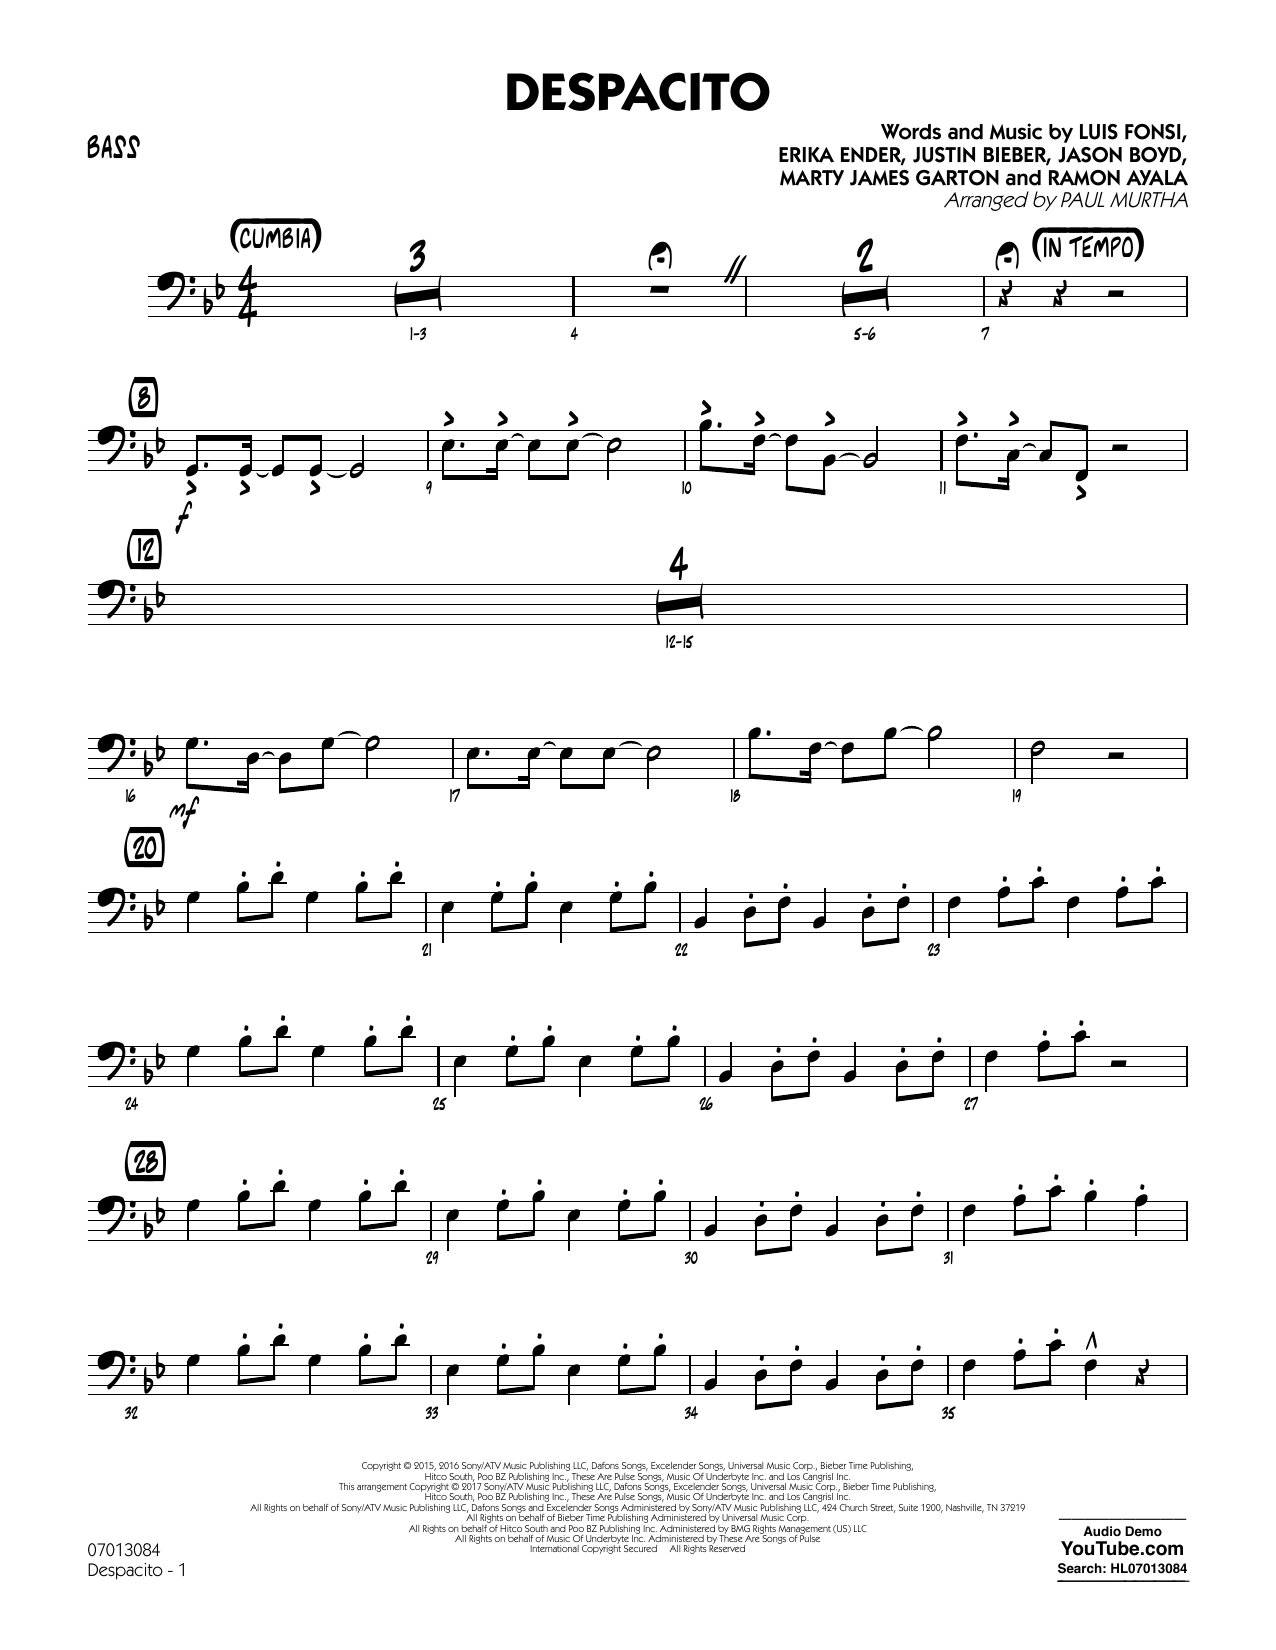 Luis Fonsi & Daddy Yankee feat. Justin Bieber Despacito (arr. Paul Murtha) - Bass sheet music notes printable PDF score